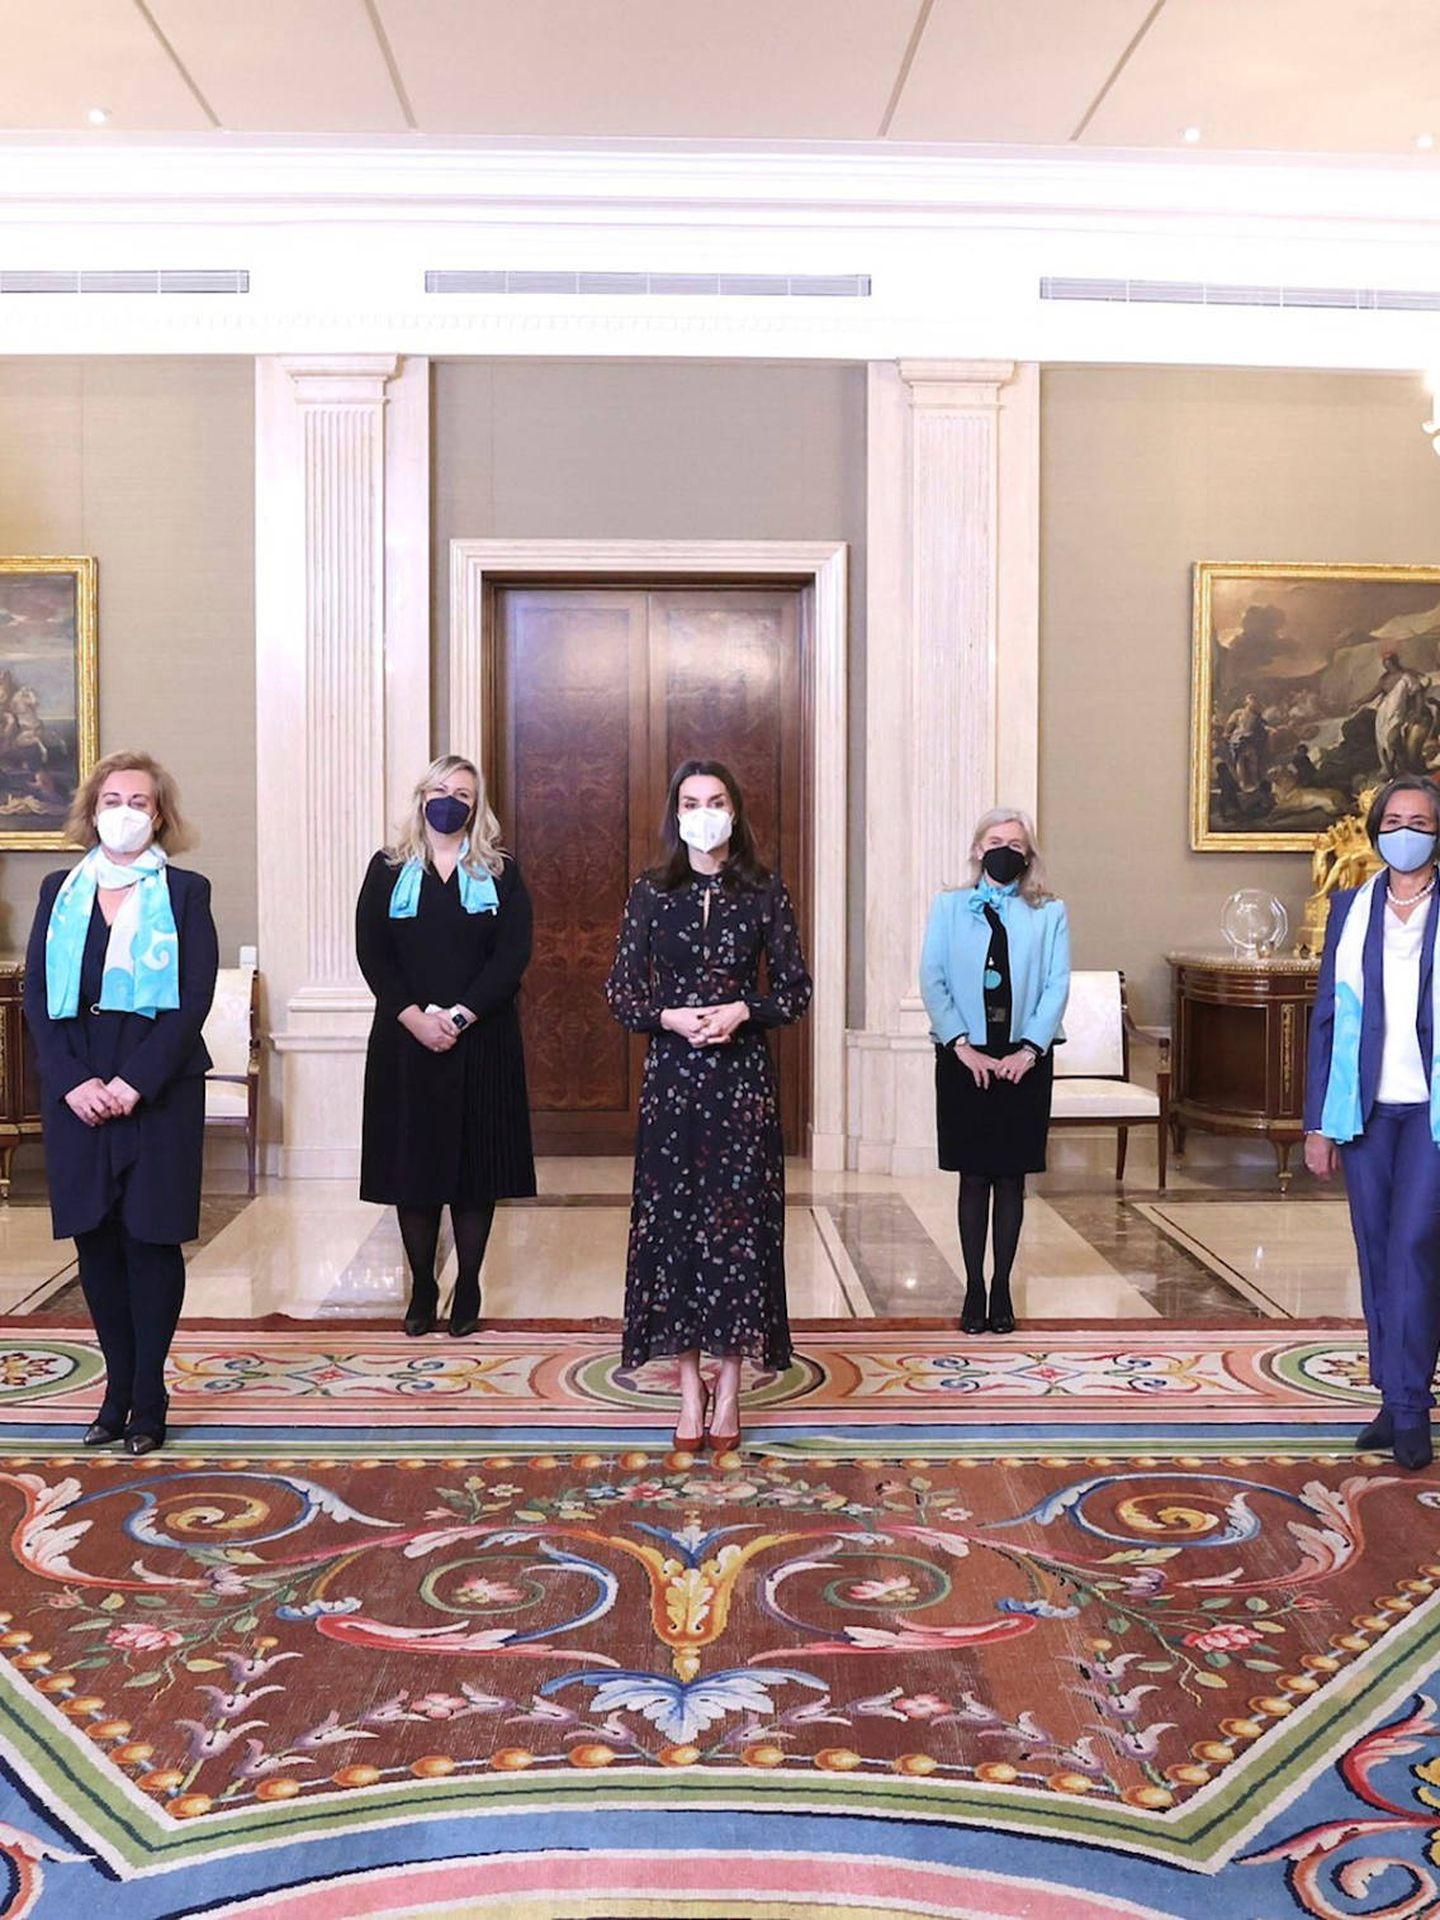 La reina Letizia. (Casa Real)